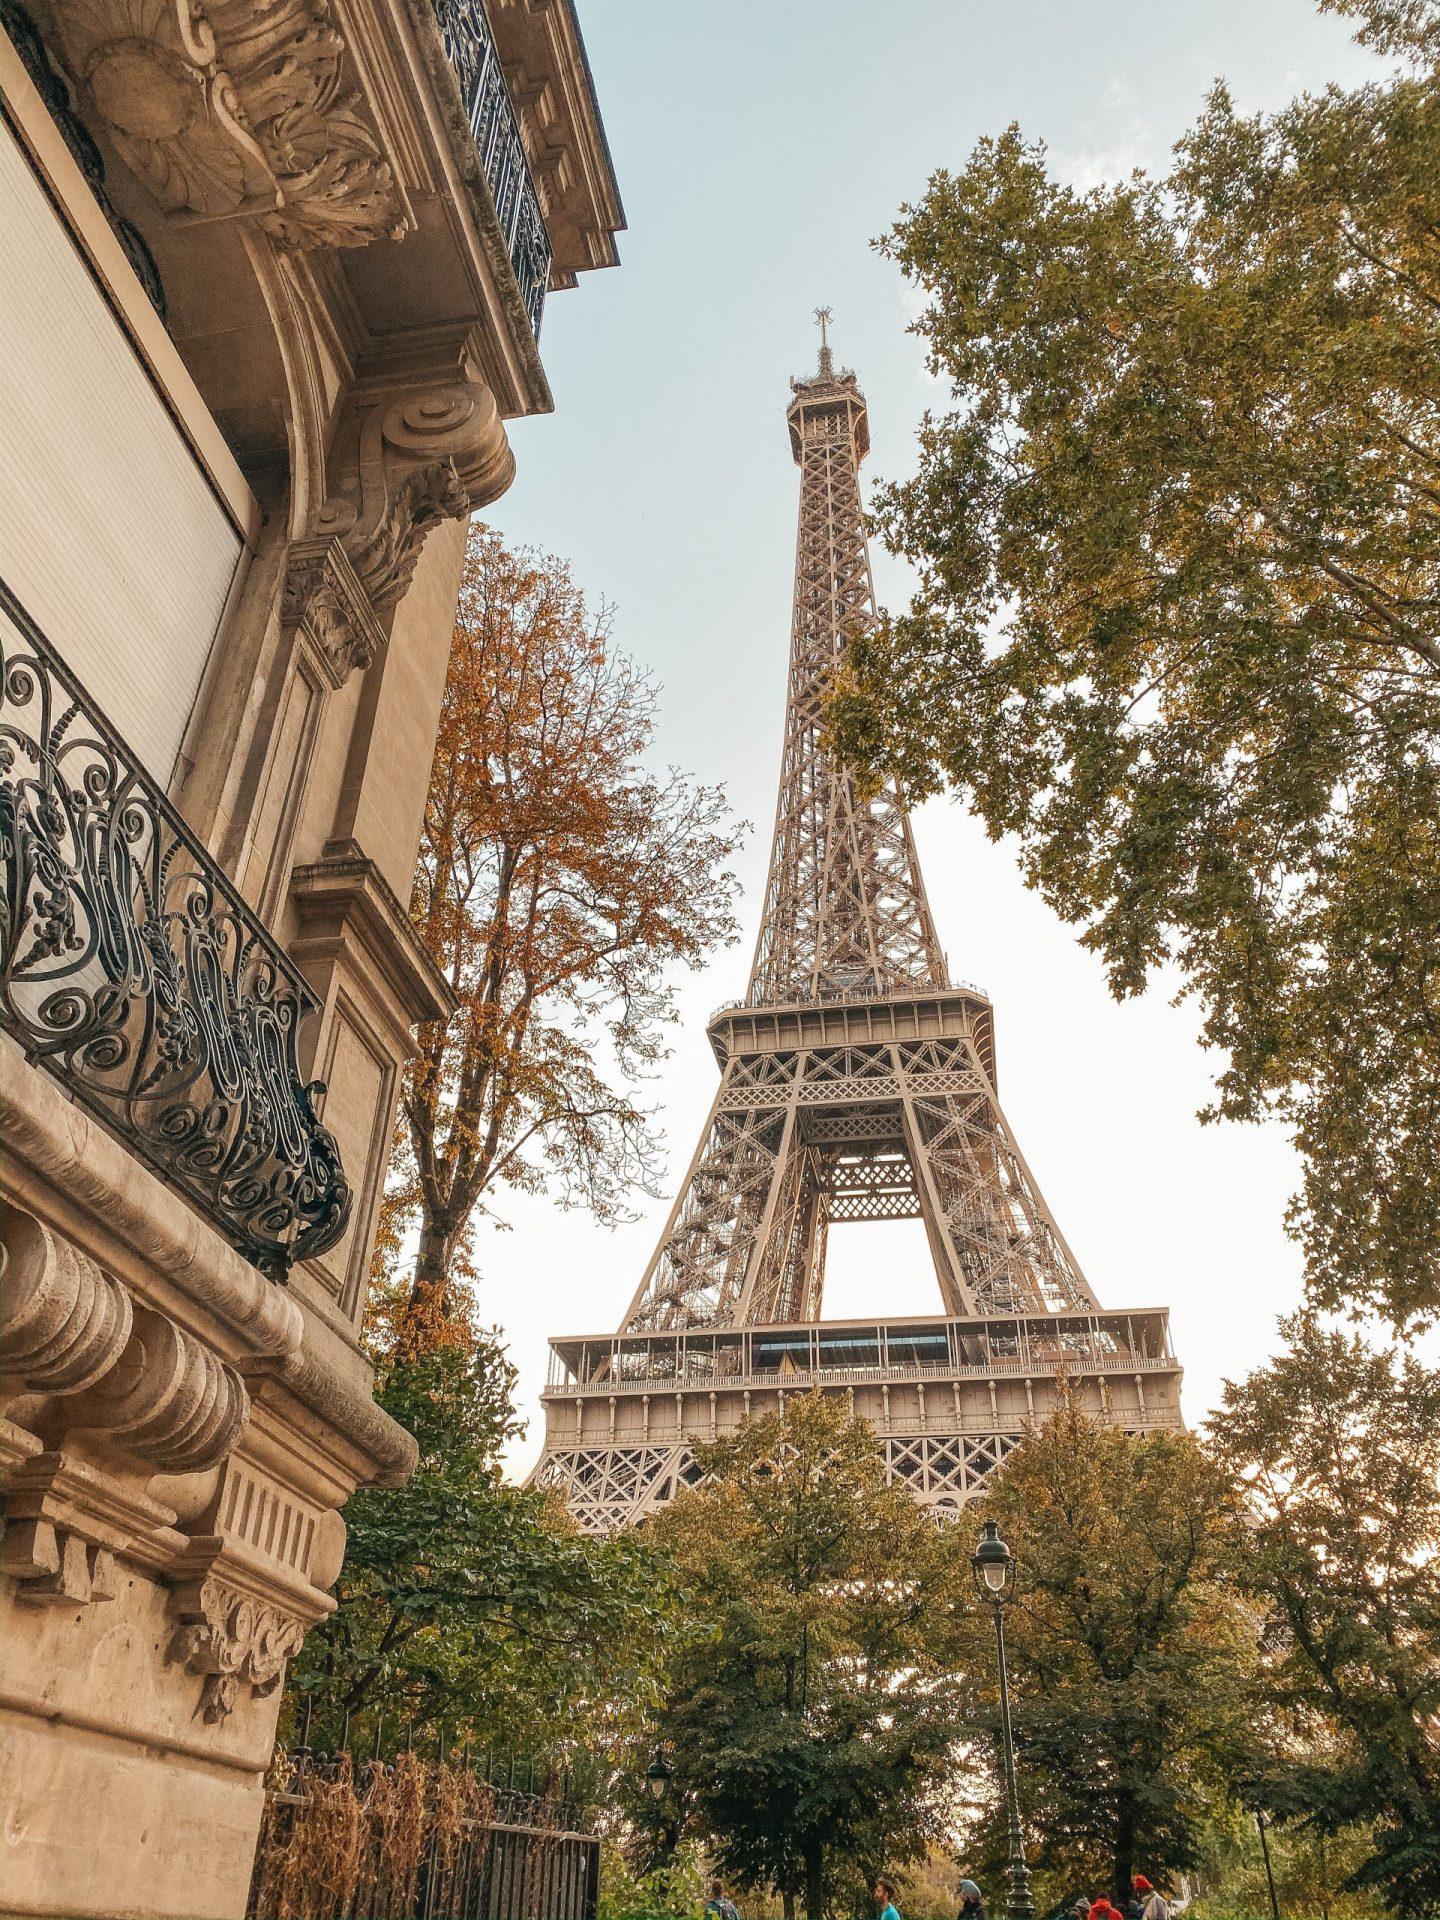 Paris. A short travel guide.